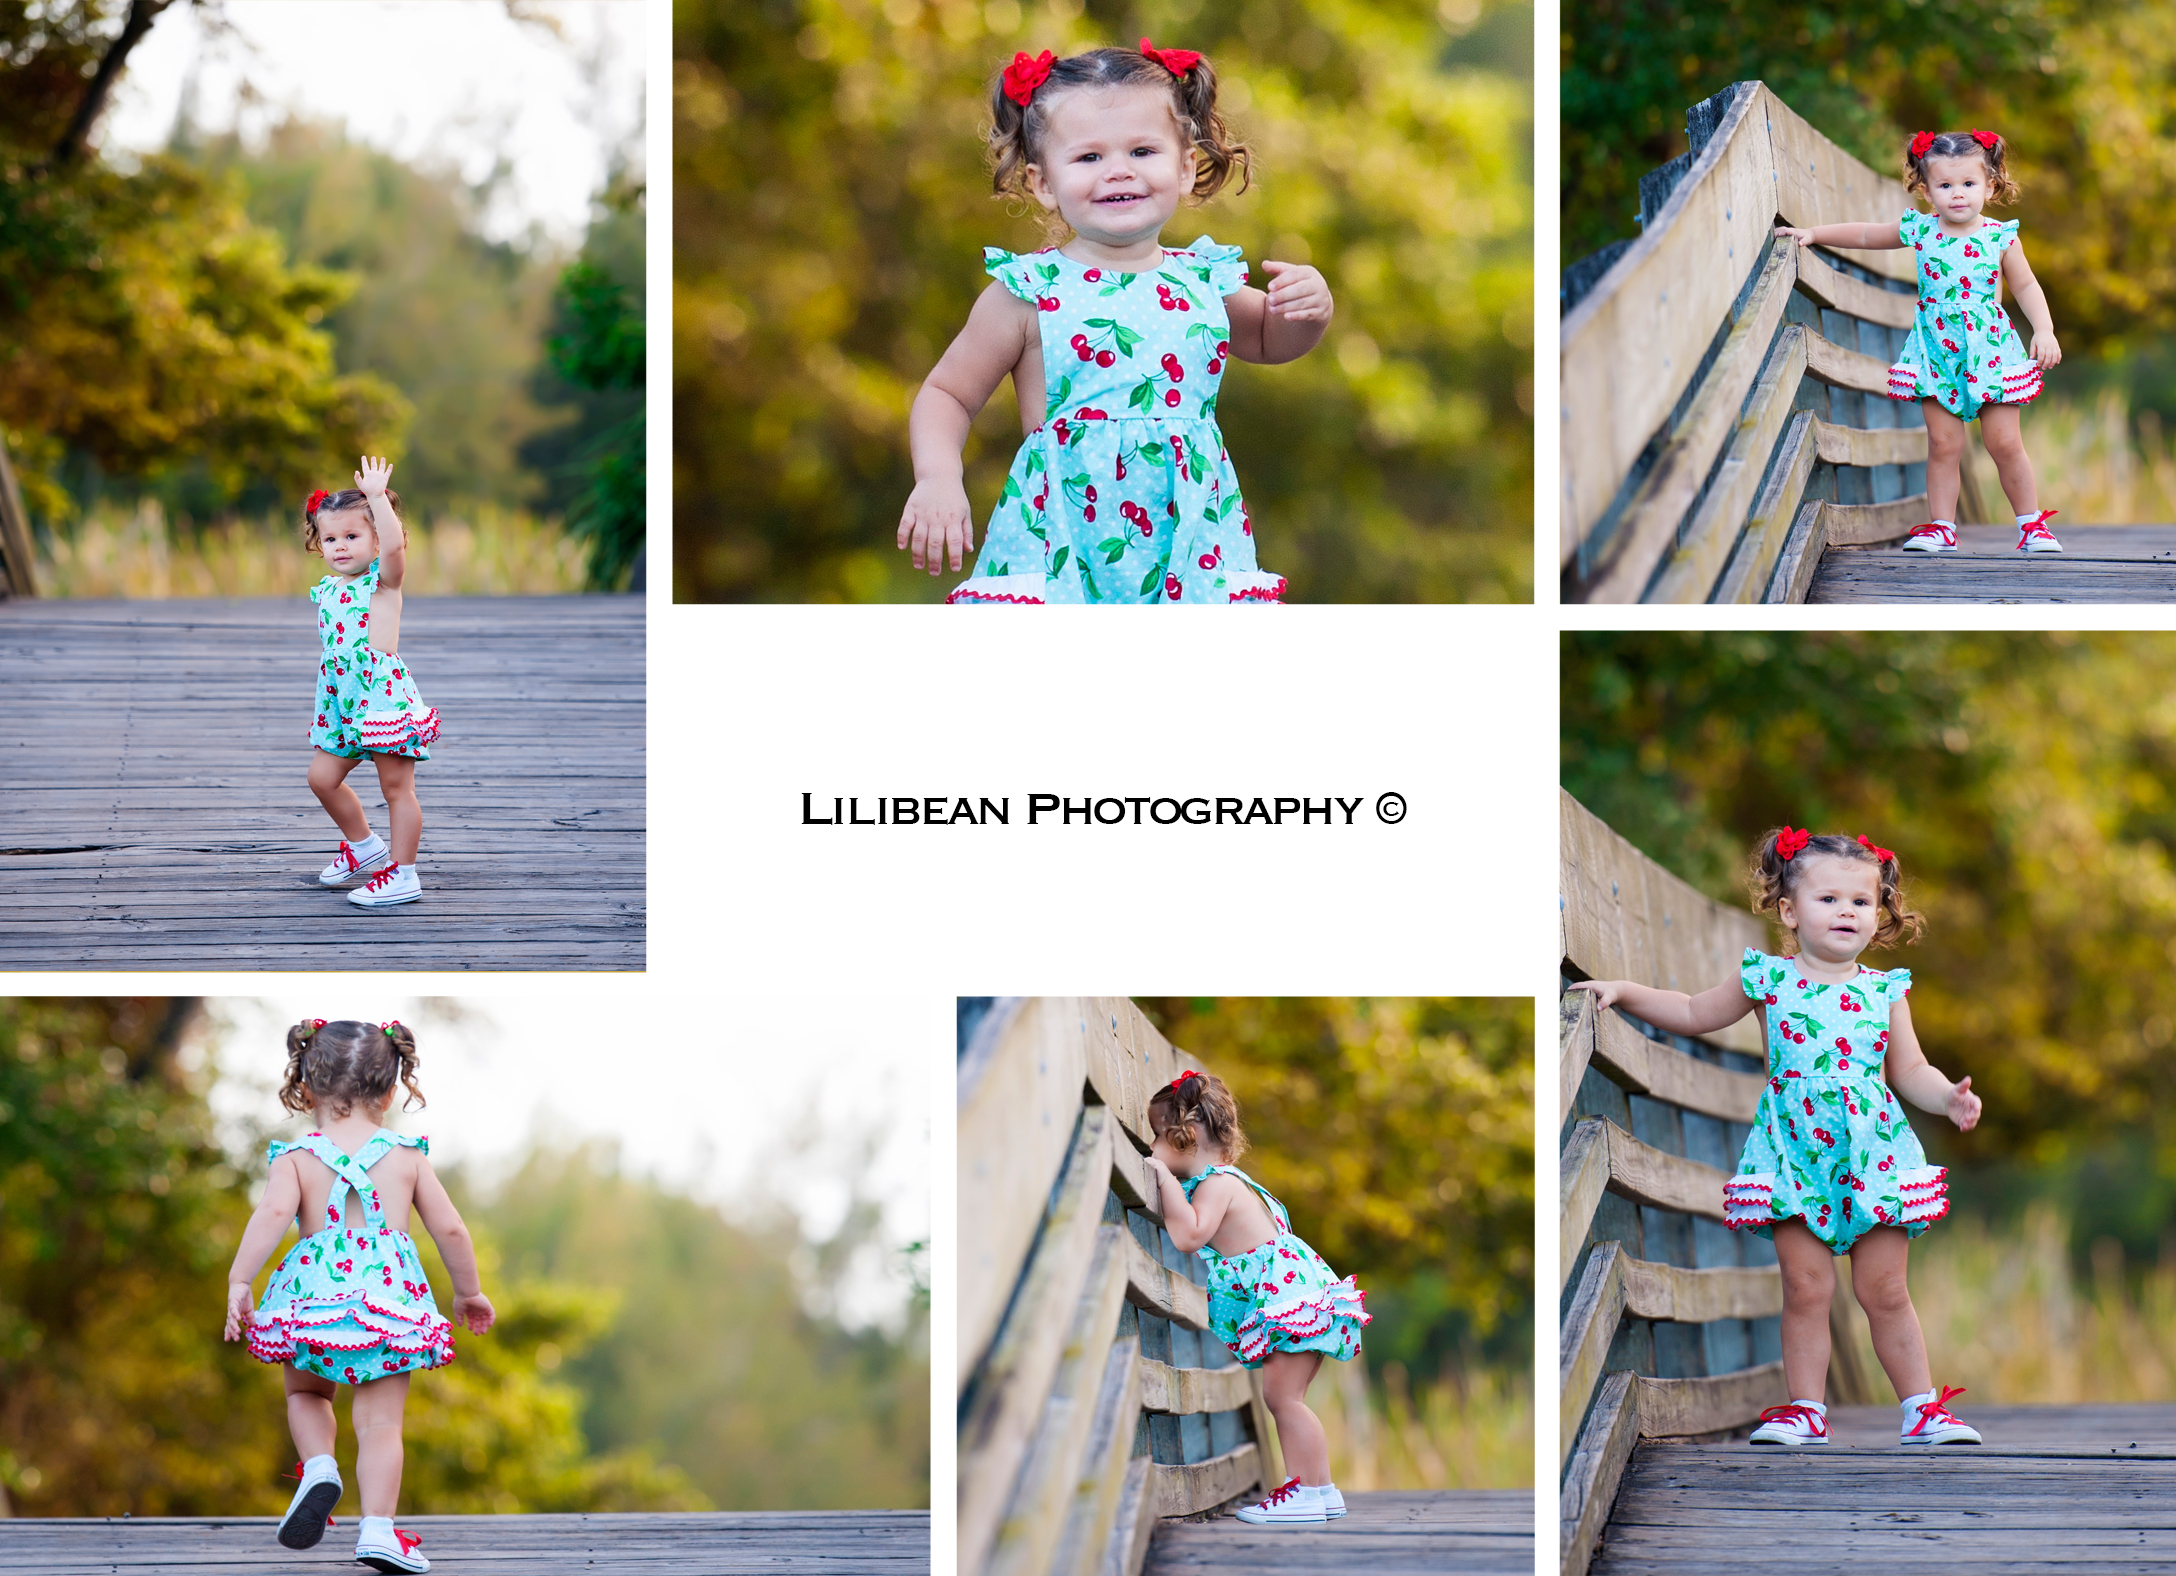 south florida maternity photographer newborn photography aventura fl sunny isles photos davie fl child session